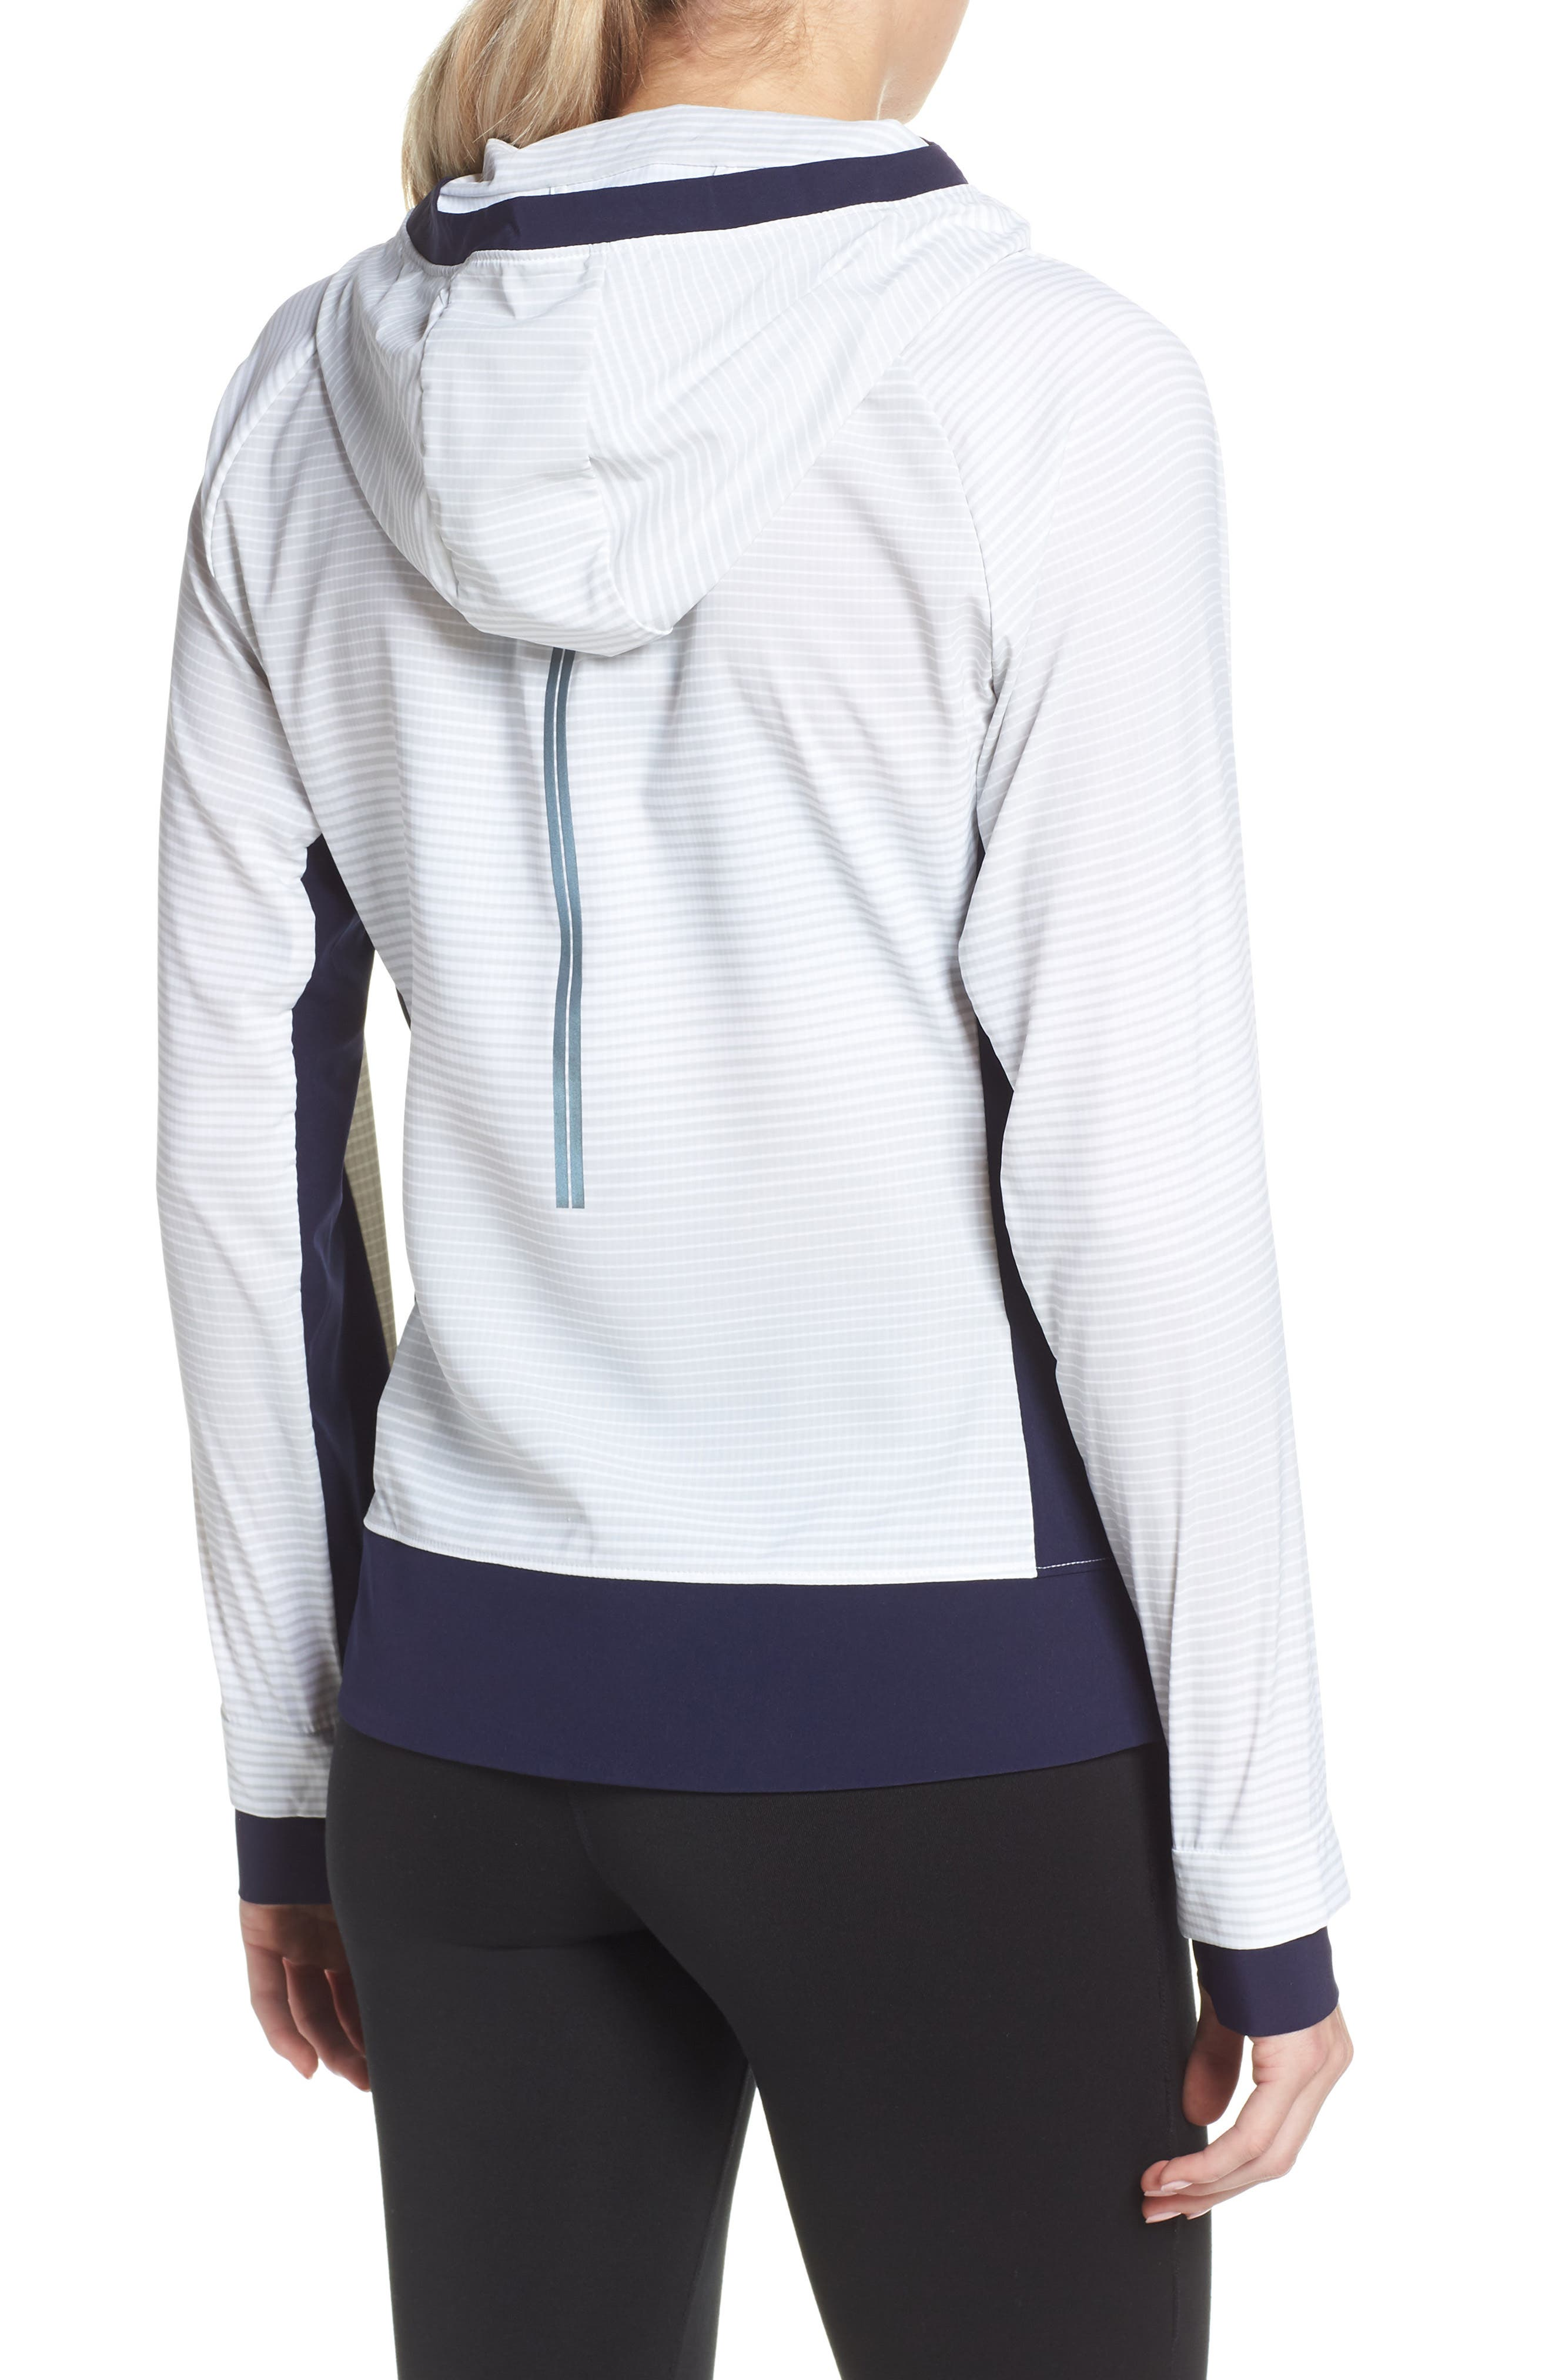 BROOKS, Canopy SE Reflective Running Jacket, Alternate thumbnail 2, color, 406